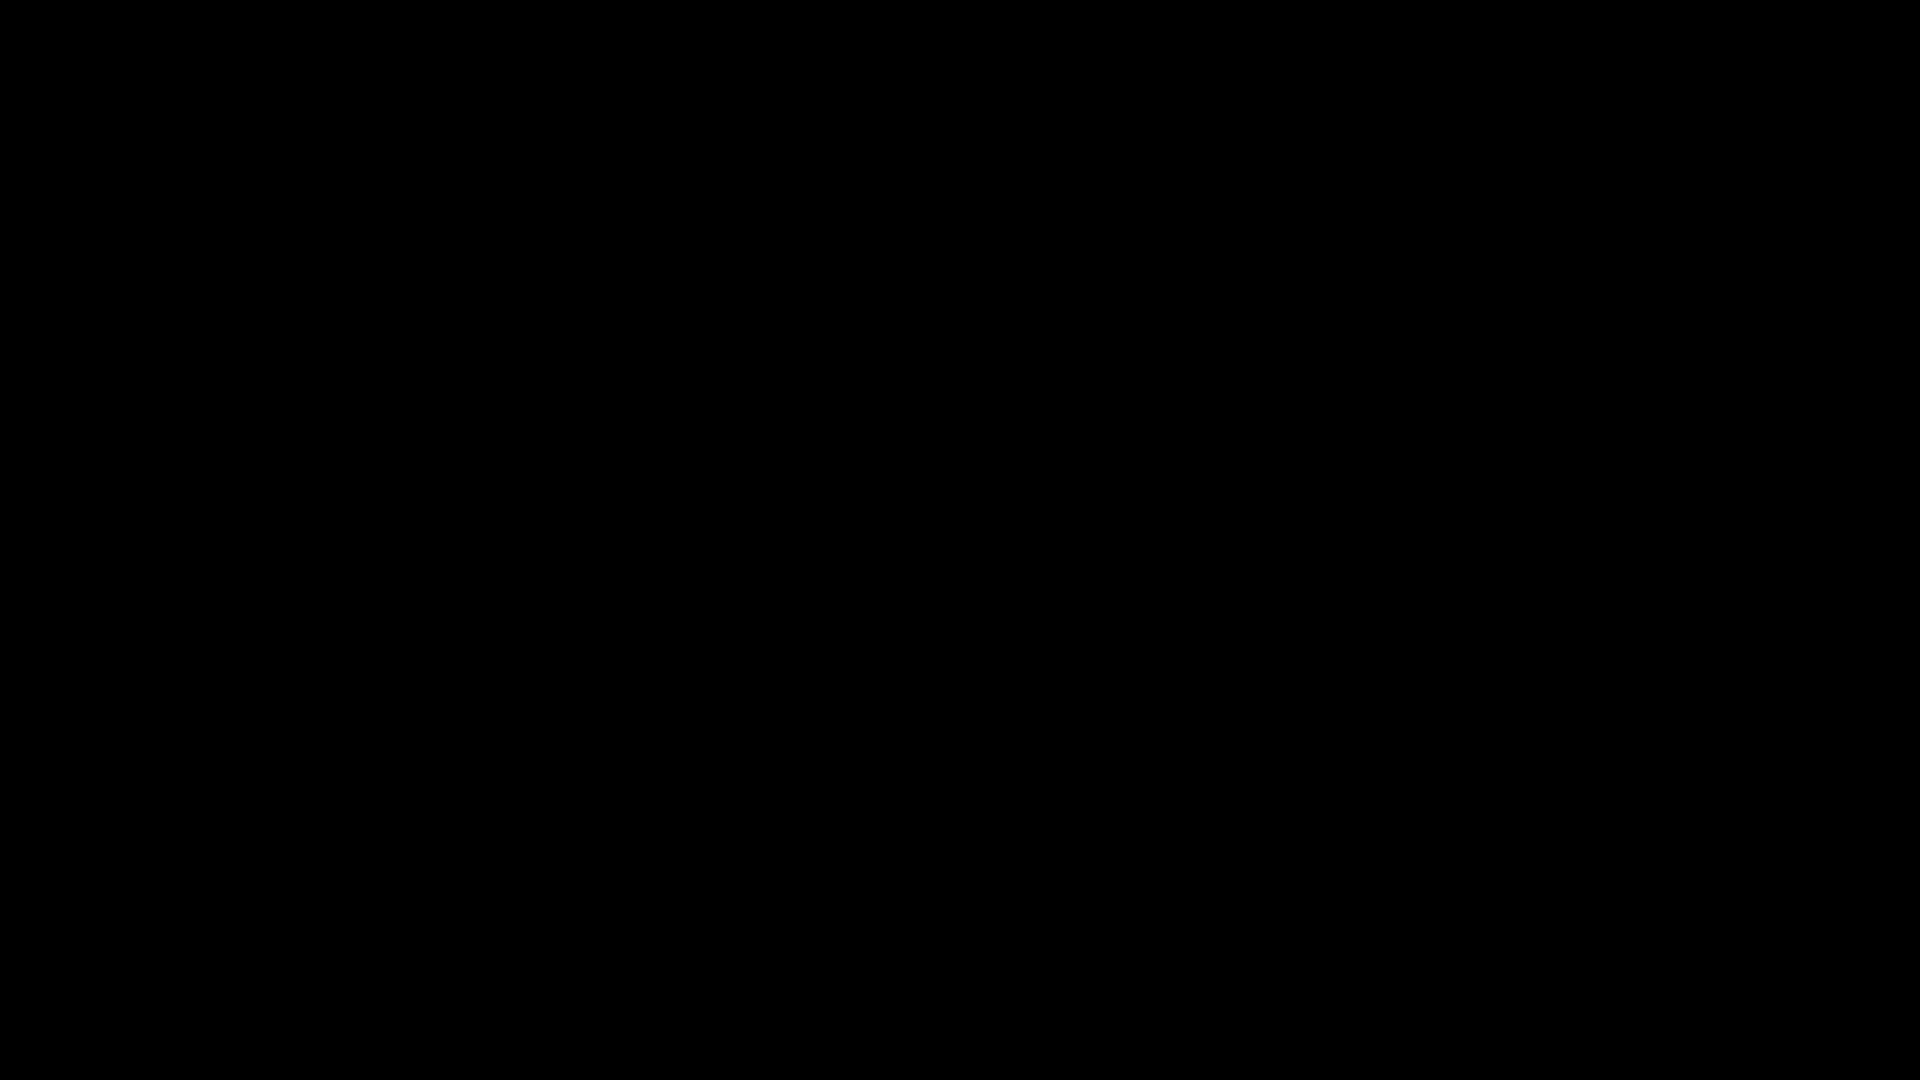 warthunder, WarThunder Otomatic inanutshell GIFs